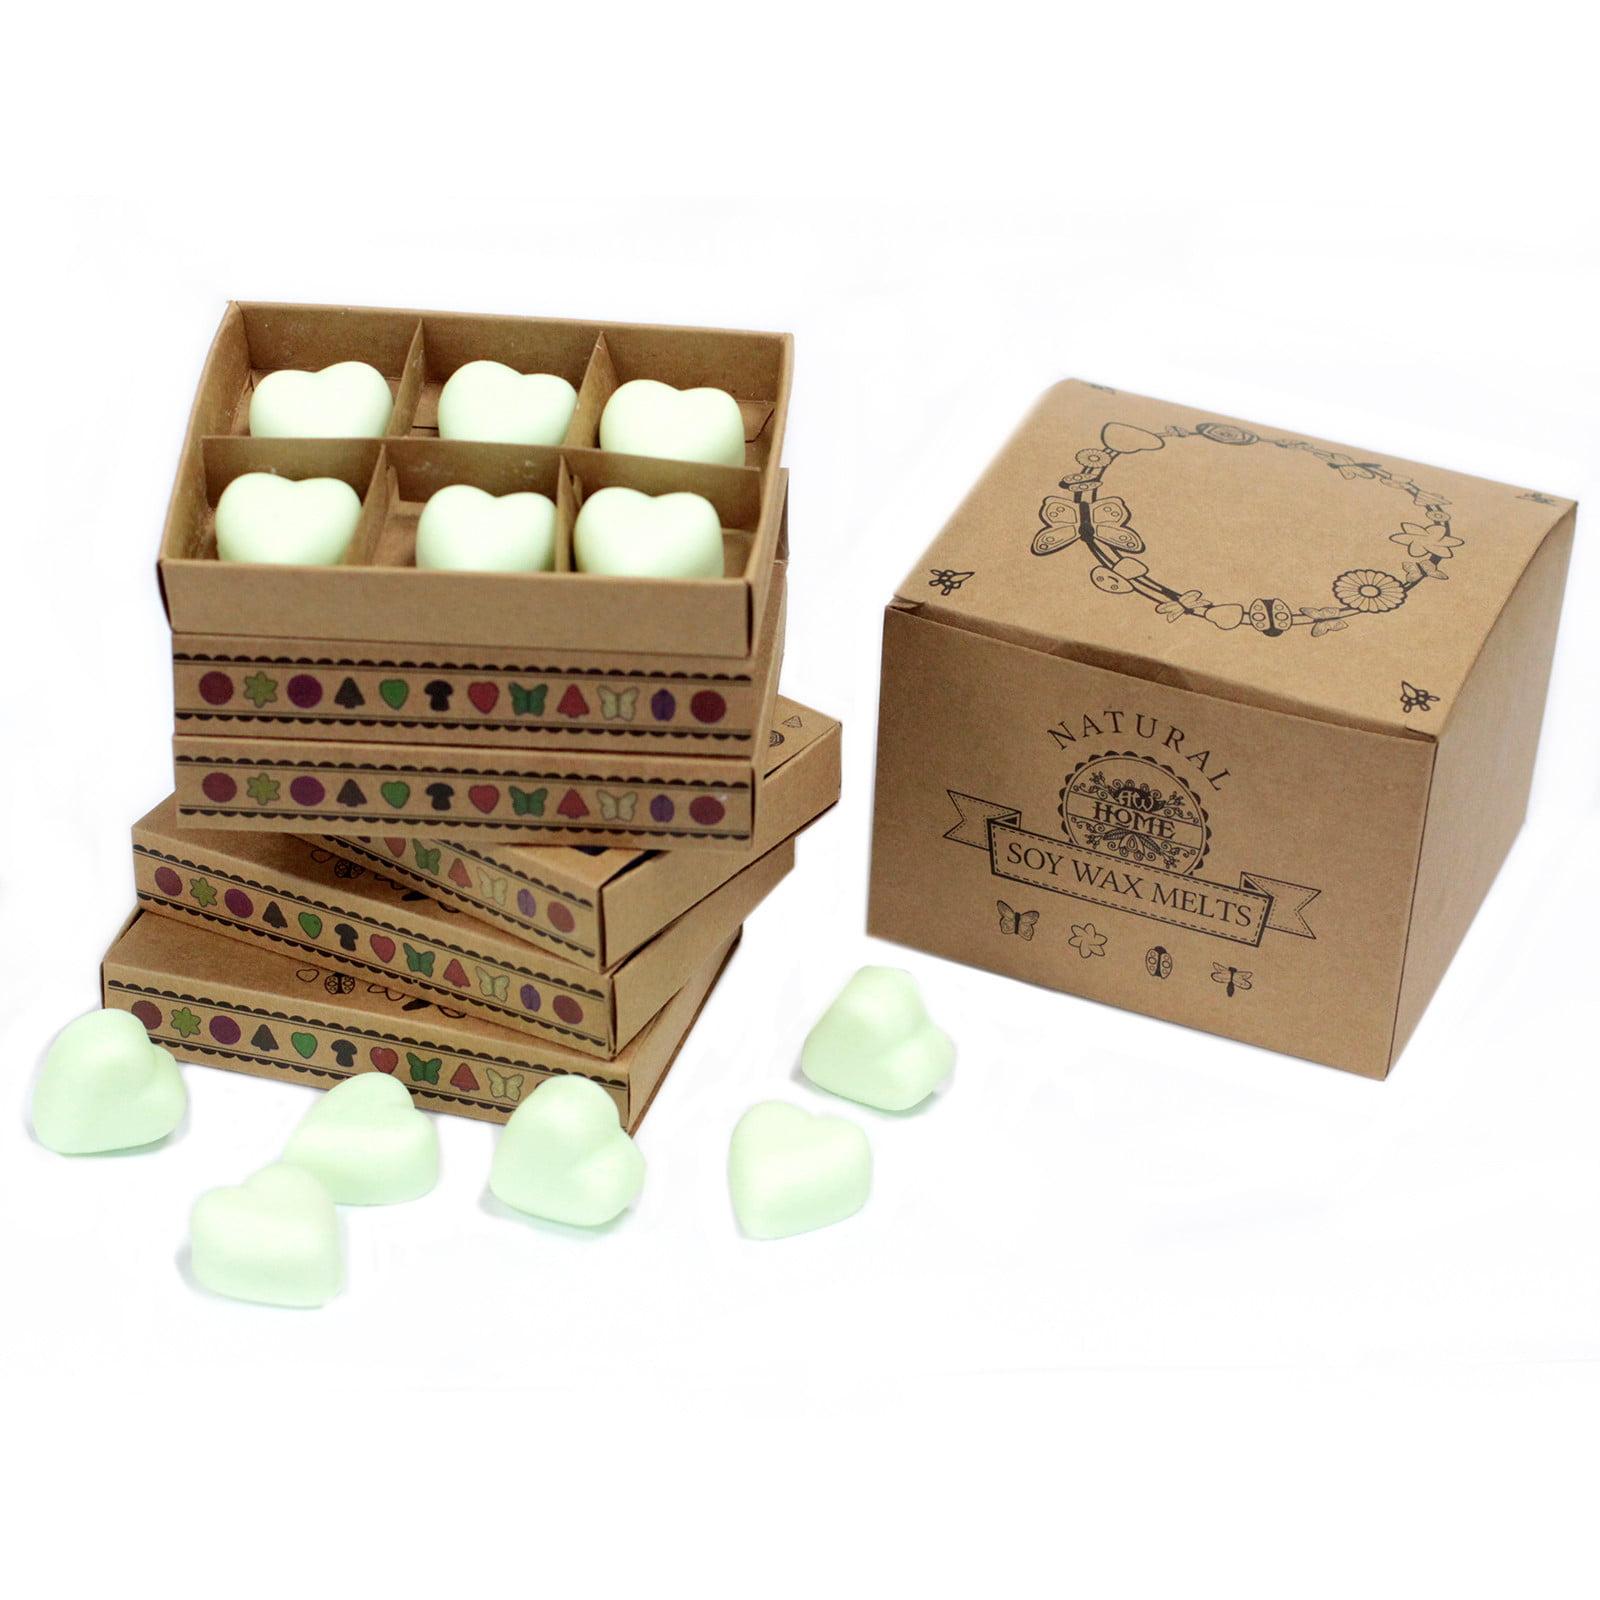 Caixa de 6 velas de soja – Menta e Mentol